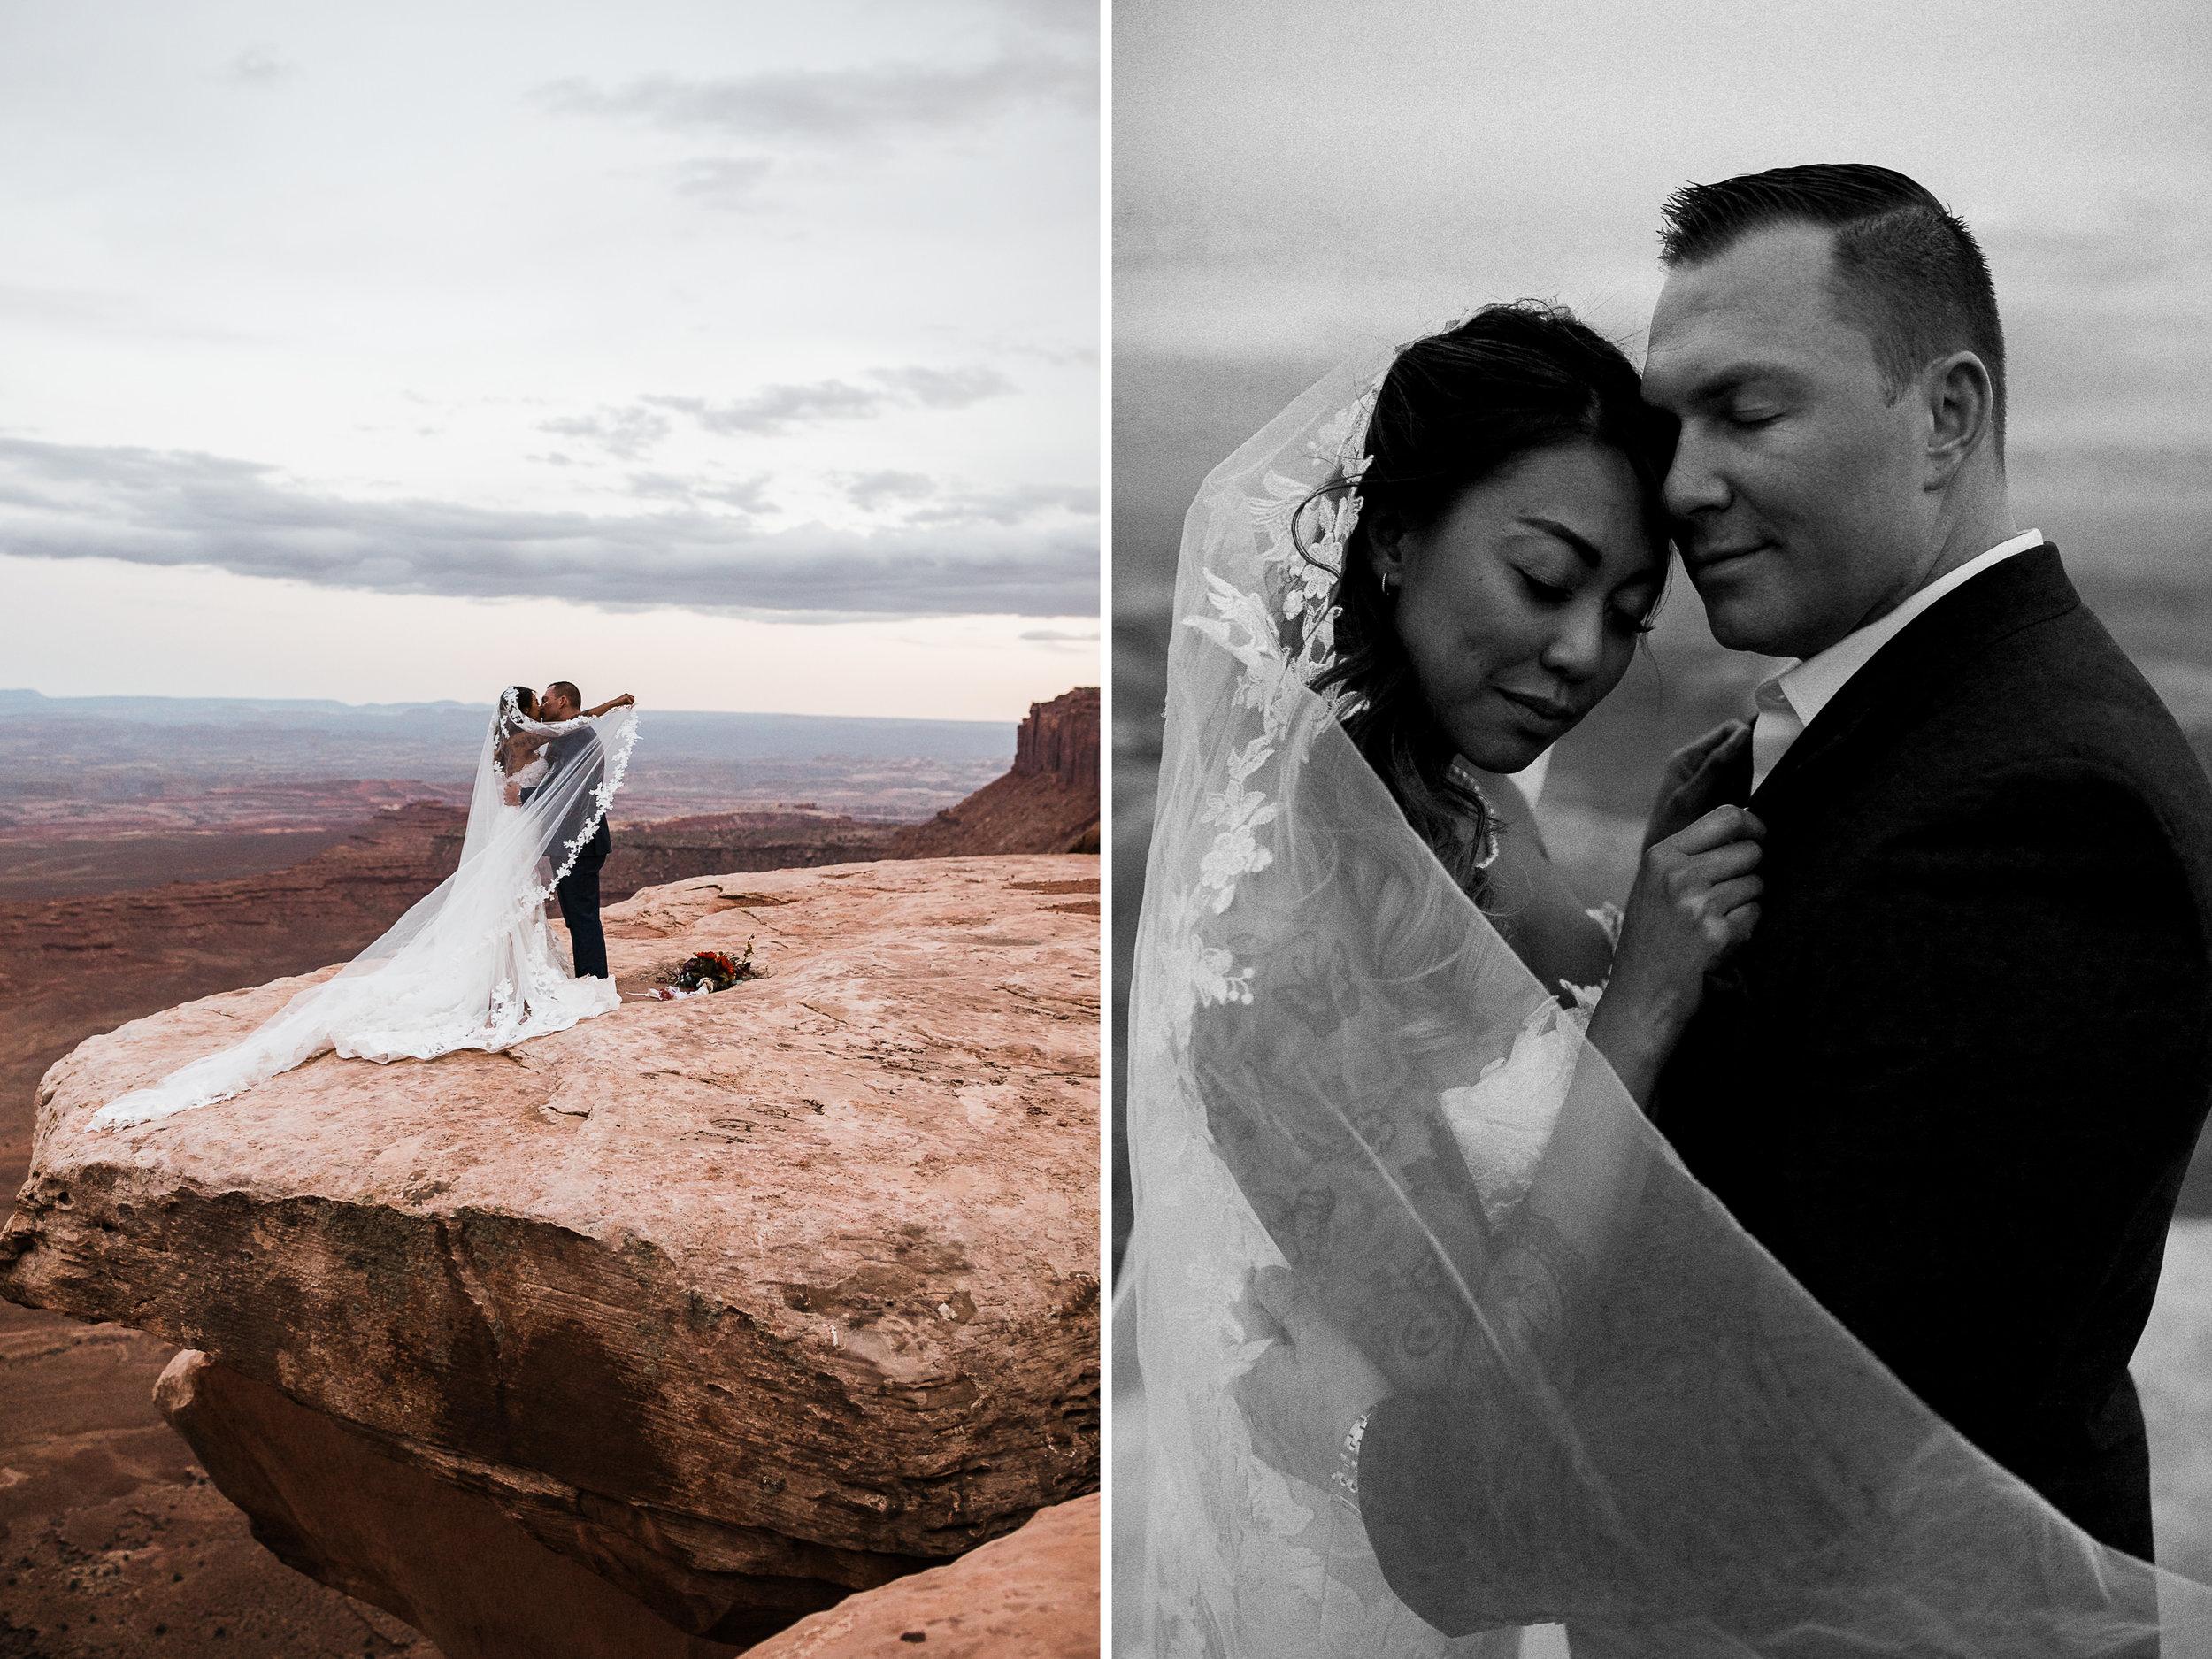 Hearnes-Elopement-Photography-Canyonlands-National-Park-Wedding-Photographer-Moab-Utah-Weddings-44.jpg